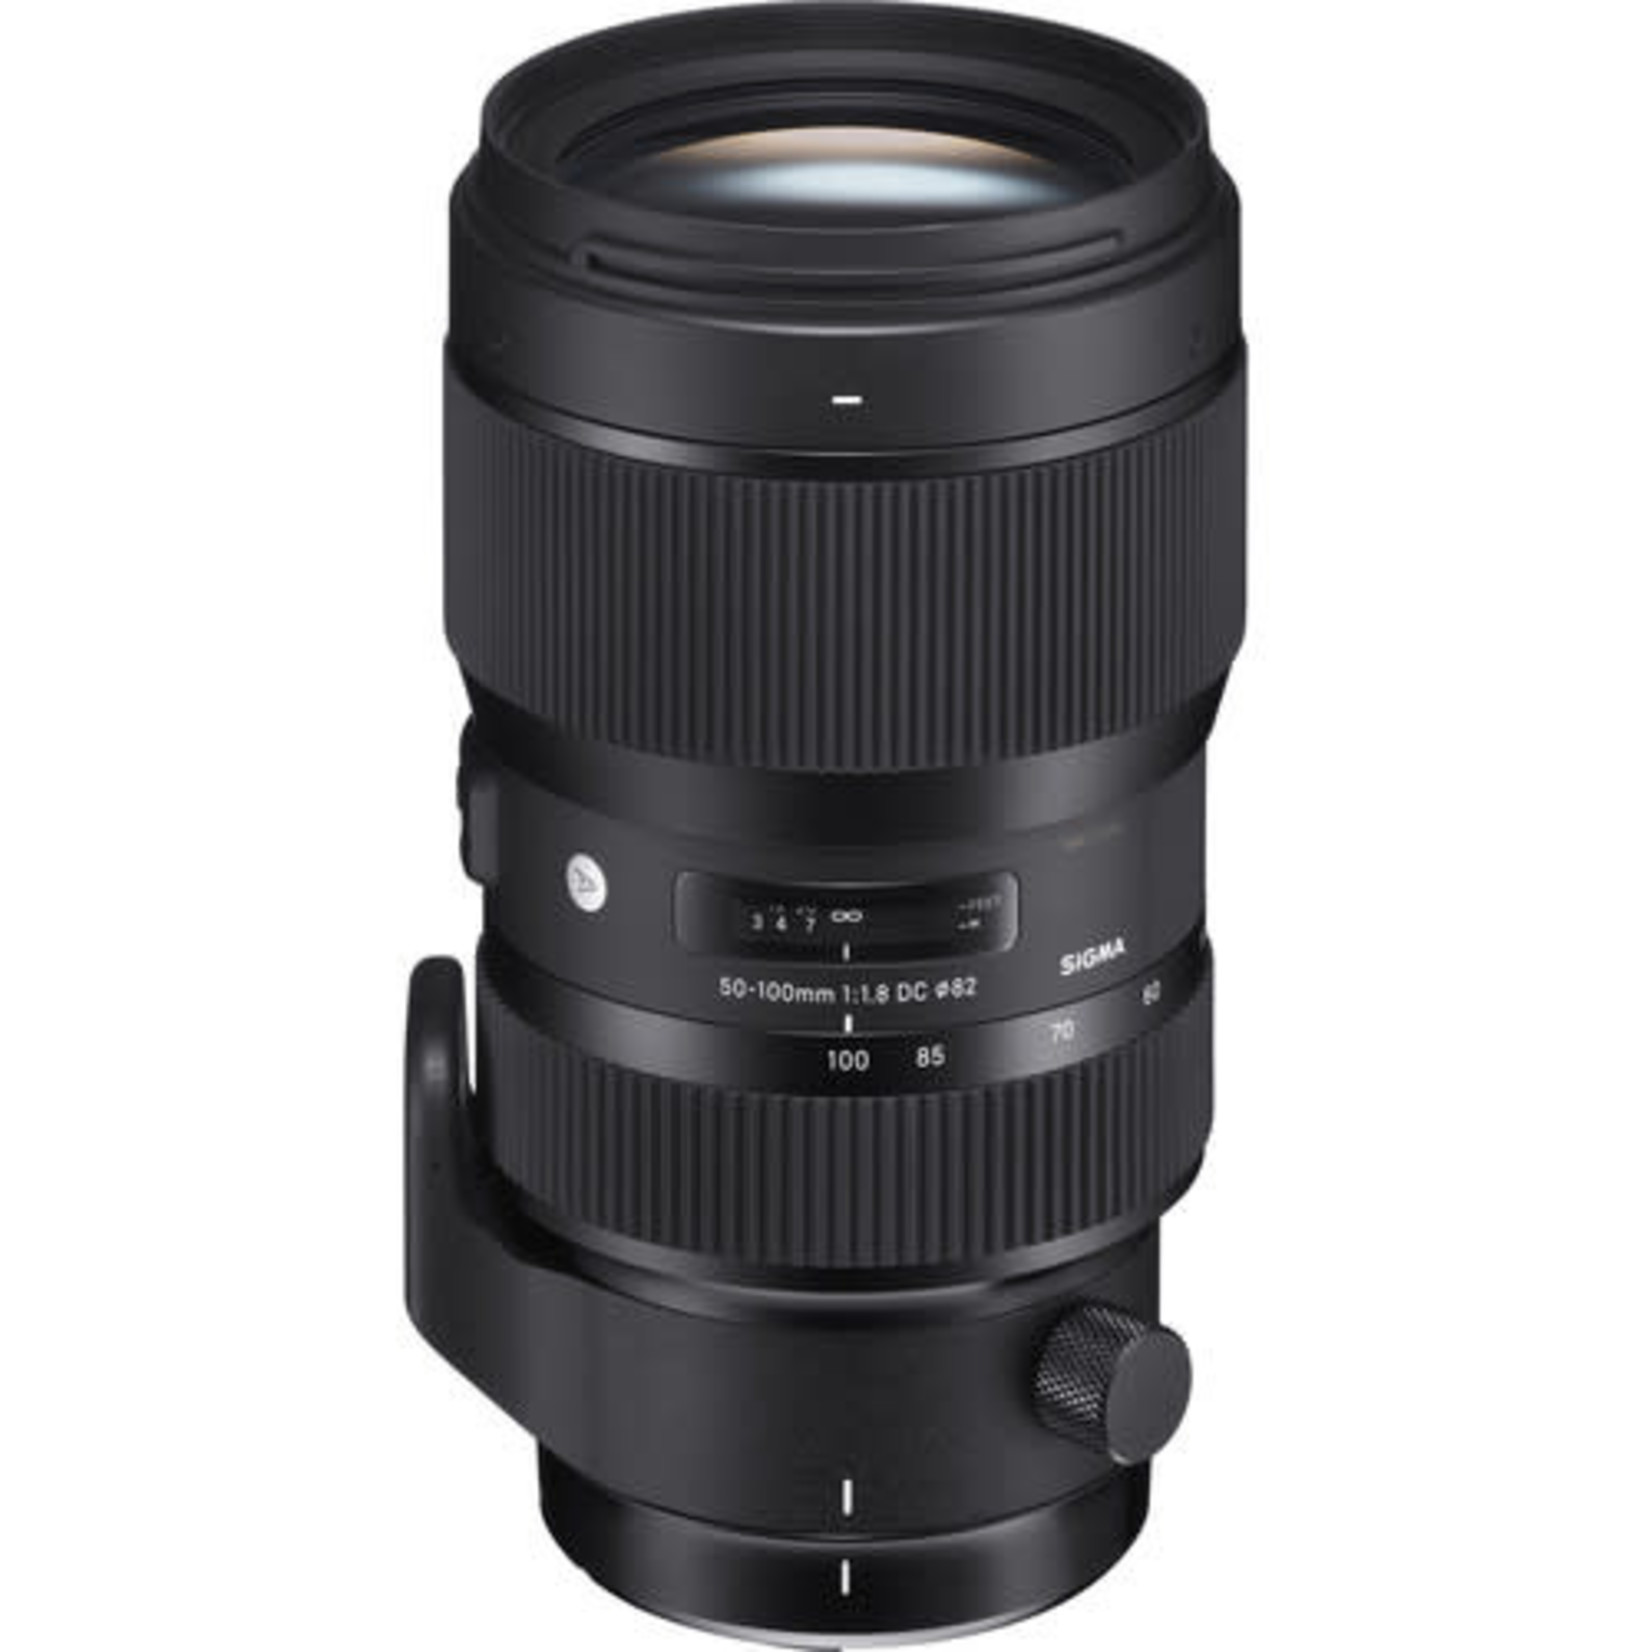 Sigma Sigma 50-100mm f/1.8 DC HSM Art Lens for Nikon F